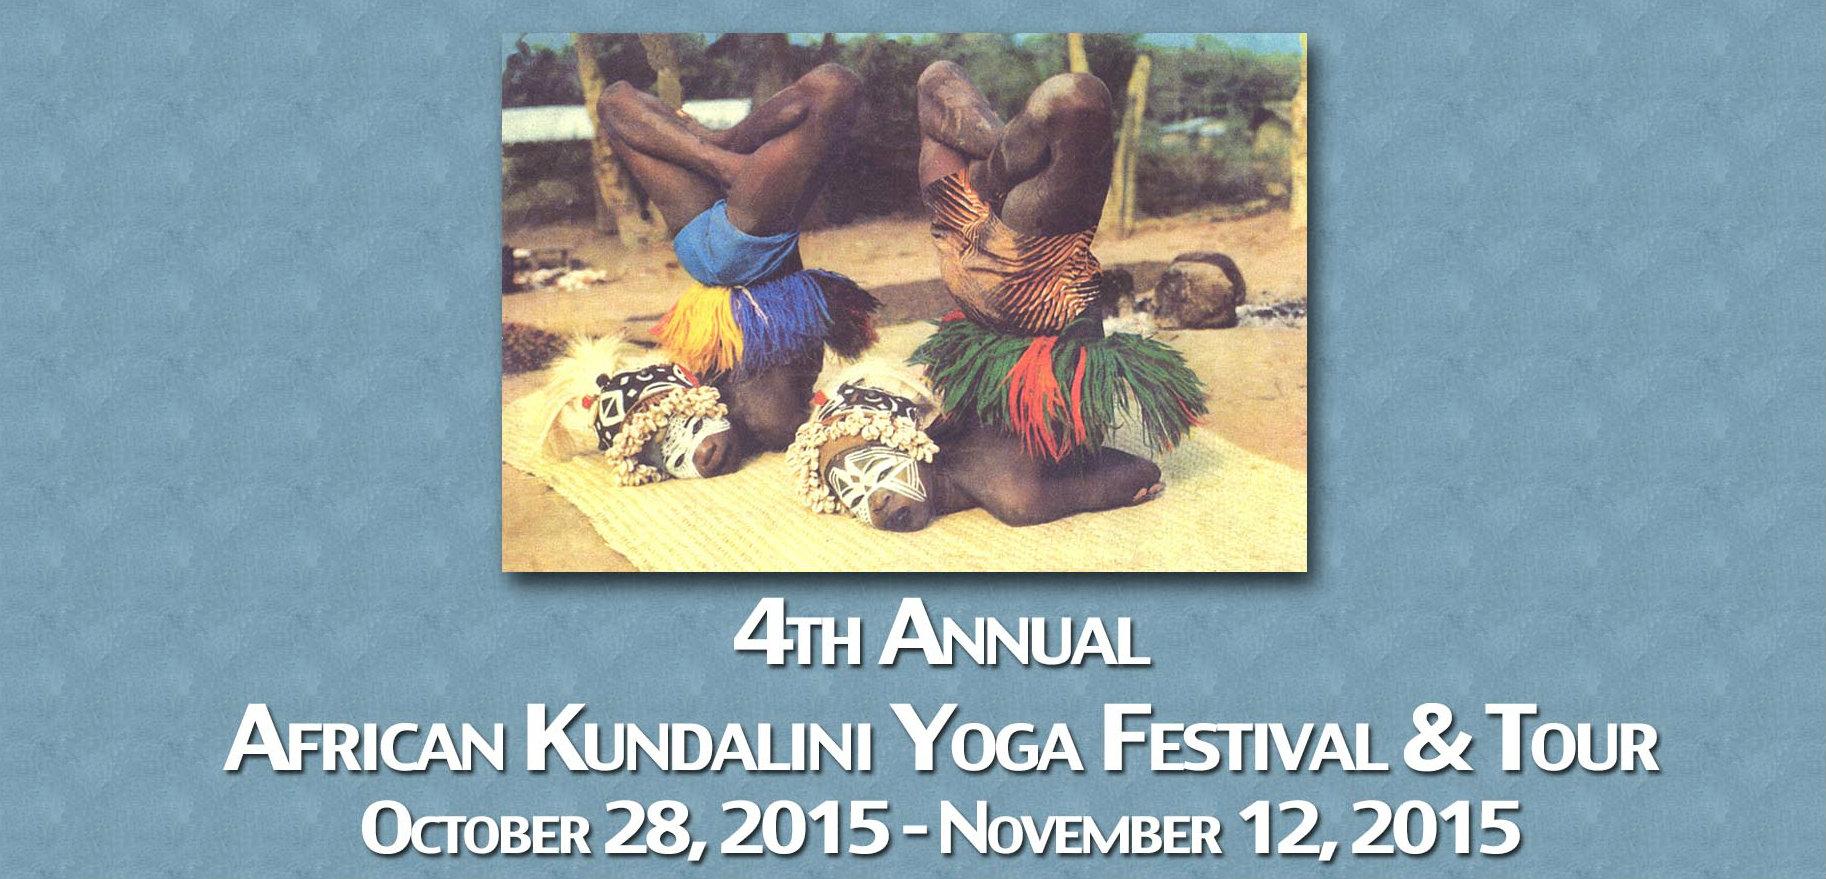 African Kundalini Yoga Festival